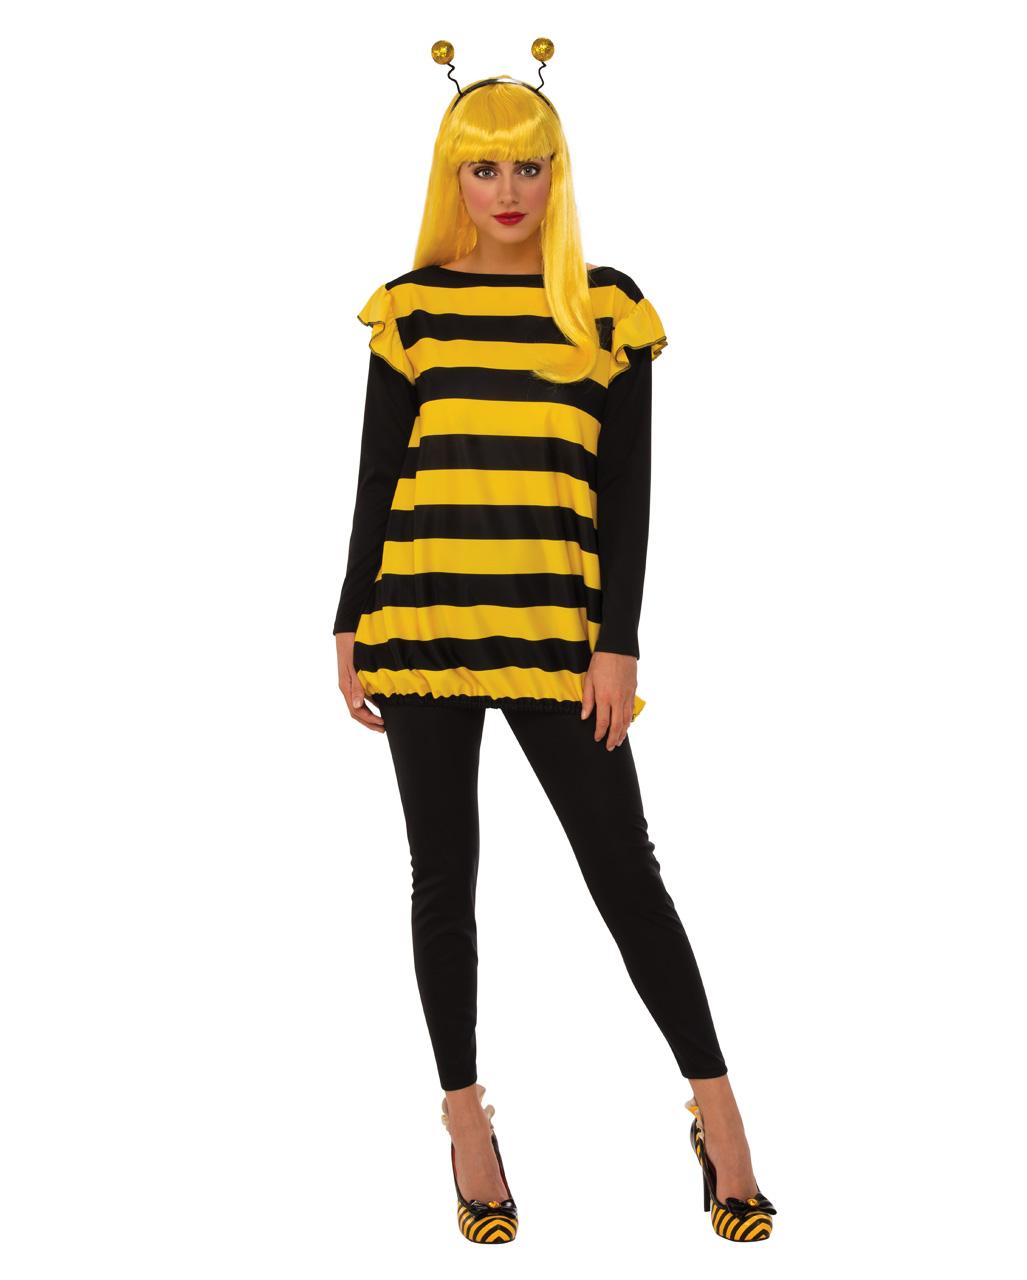 Bienenkostum Fur Damen Tierkostum Karneval Universe